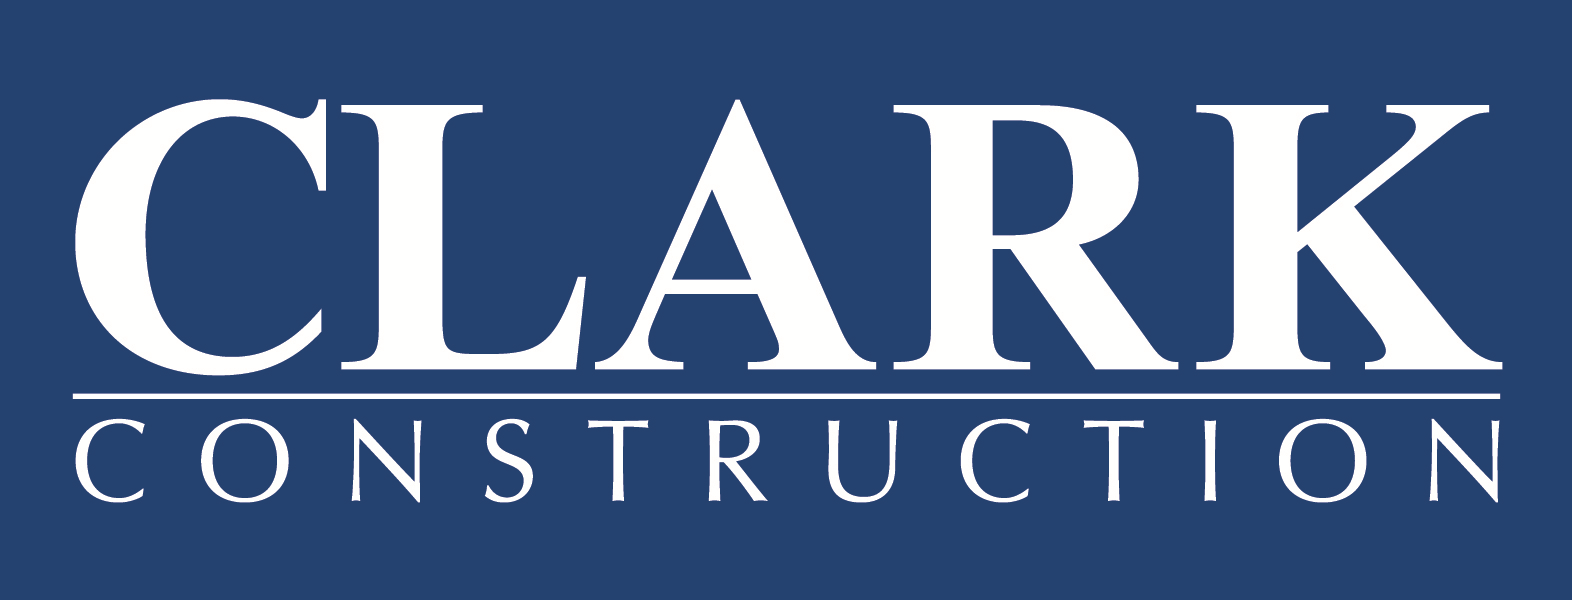 Clark Constructions